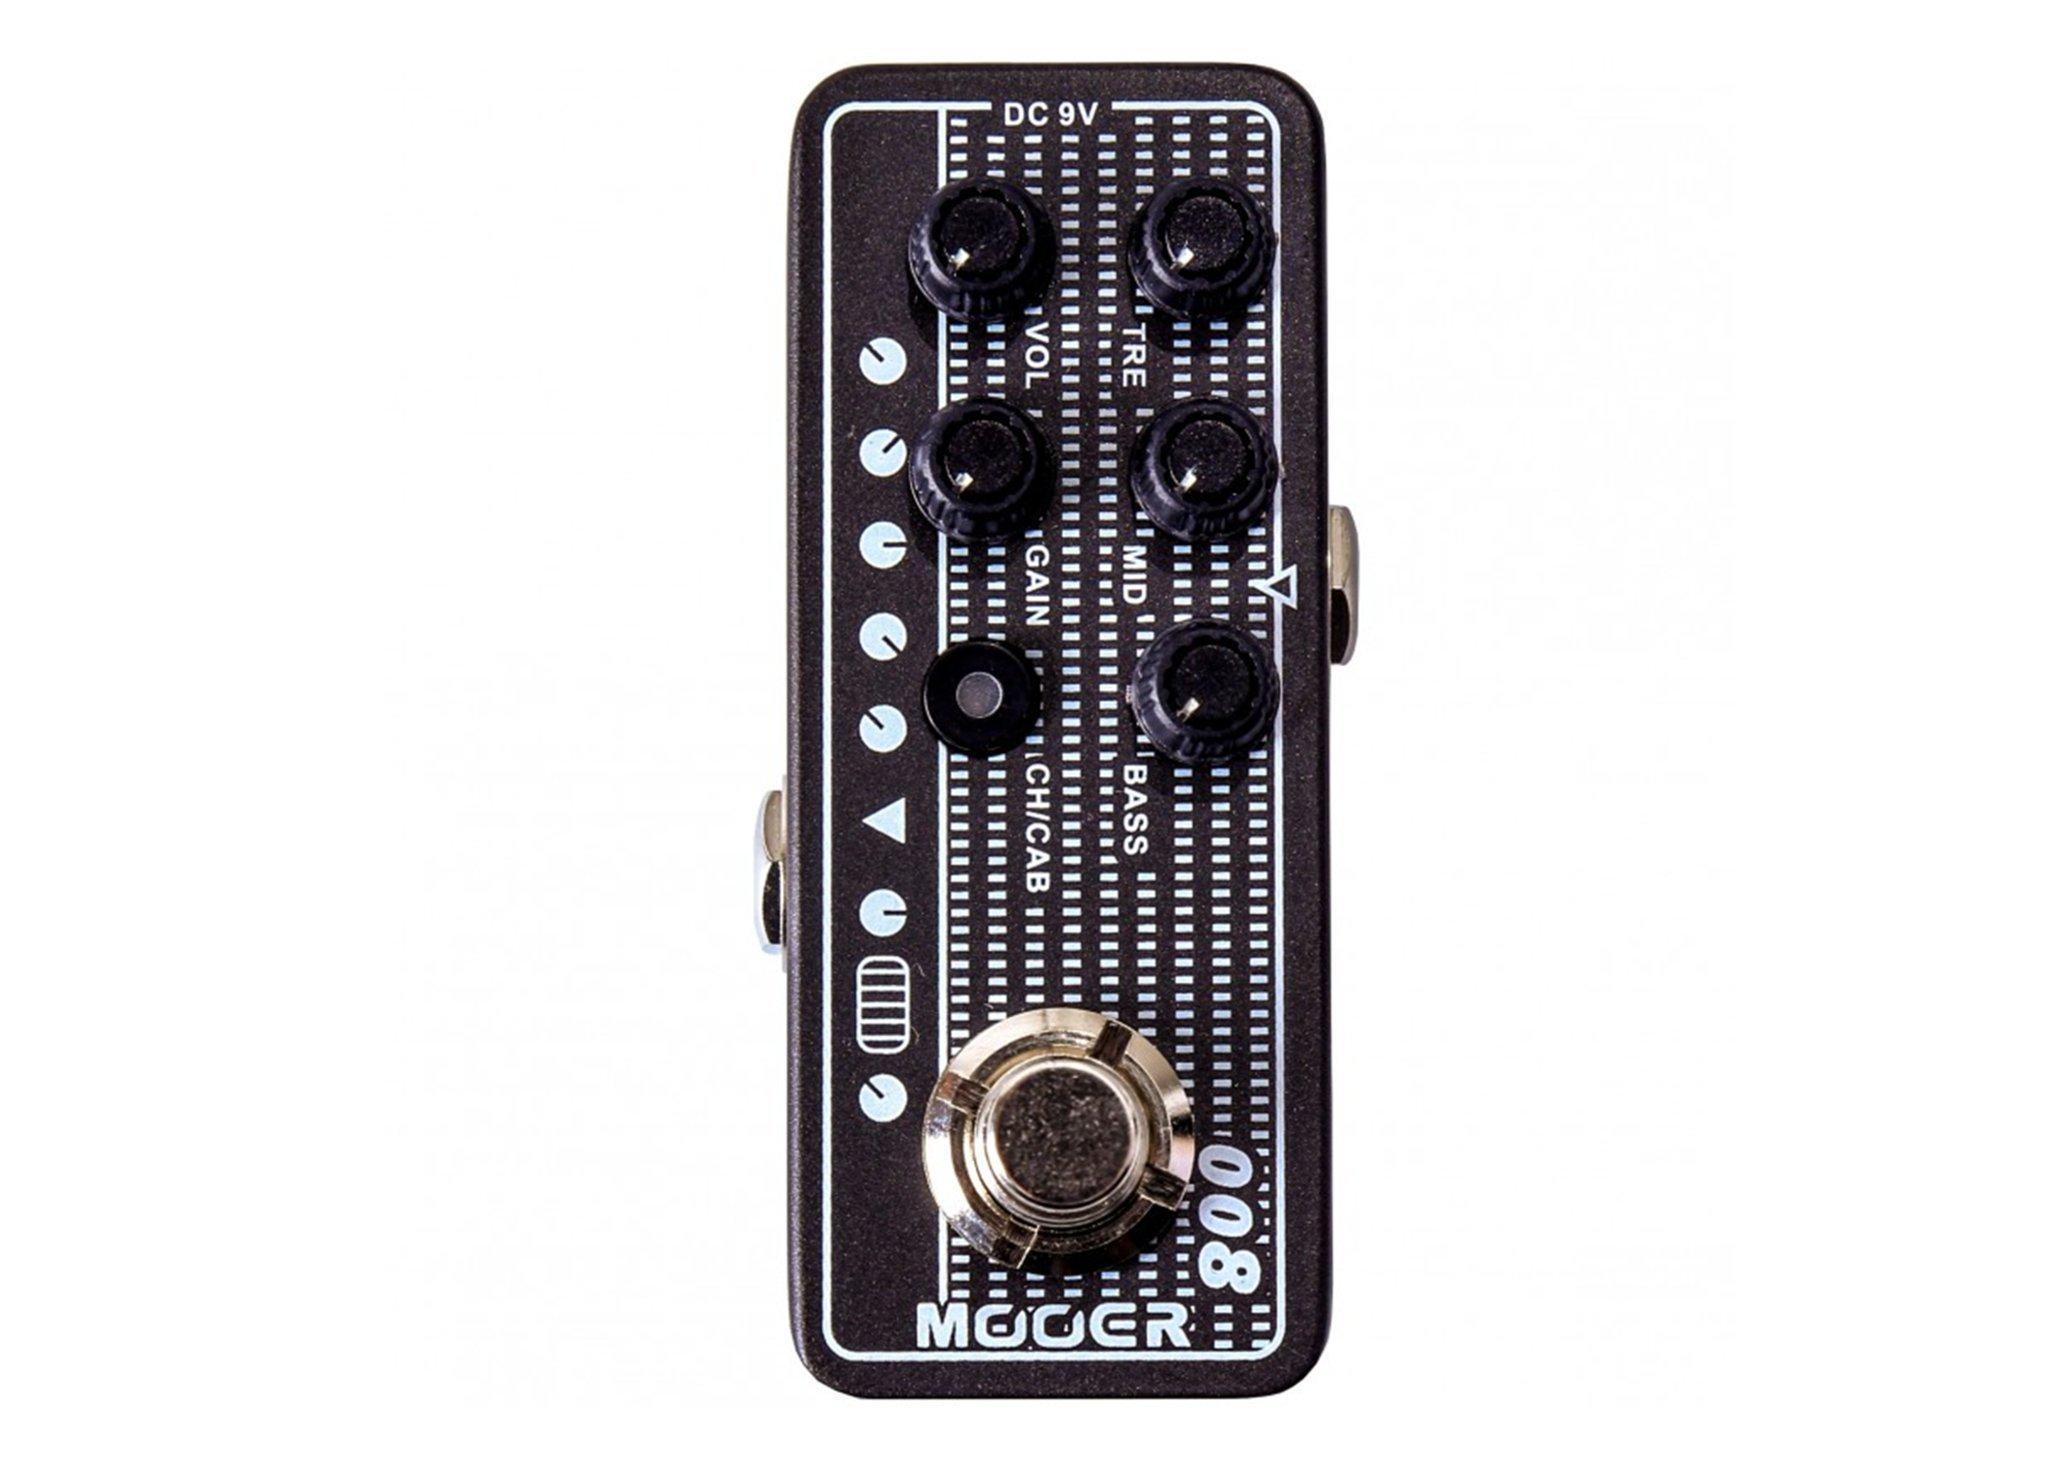 Mooer Micro Preamp 008 Cali-MK3 w/Bonus RIS Pick (x1) 6943206792178